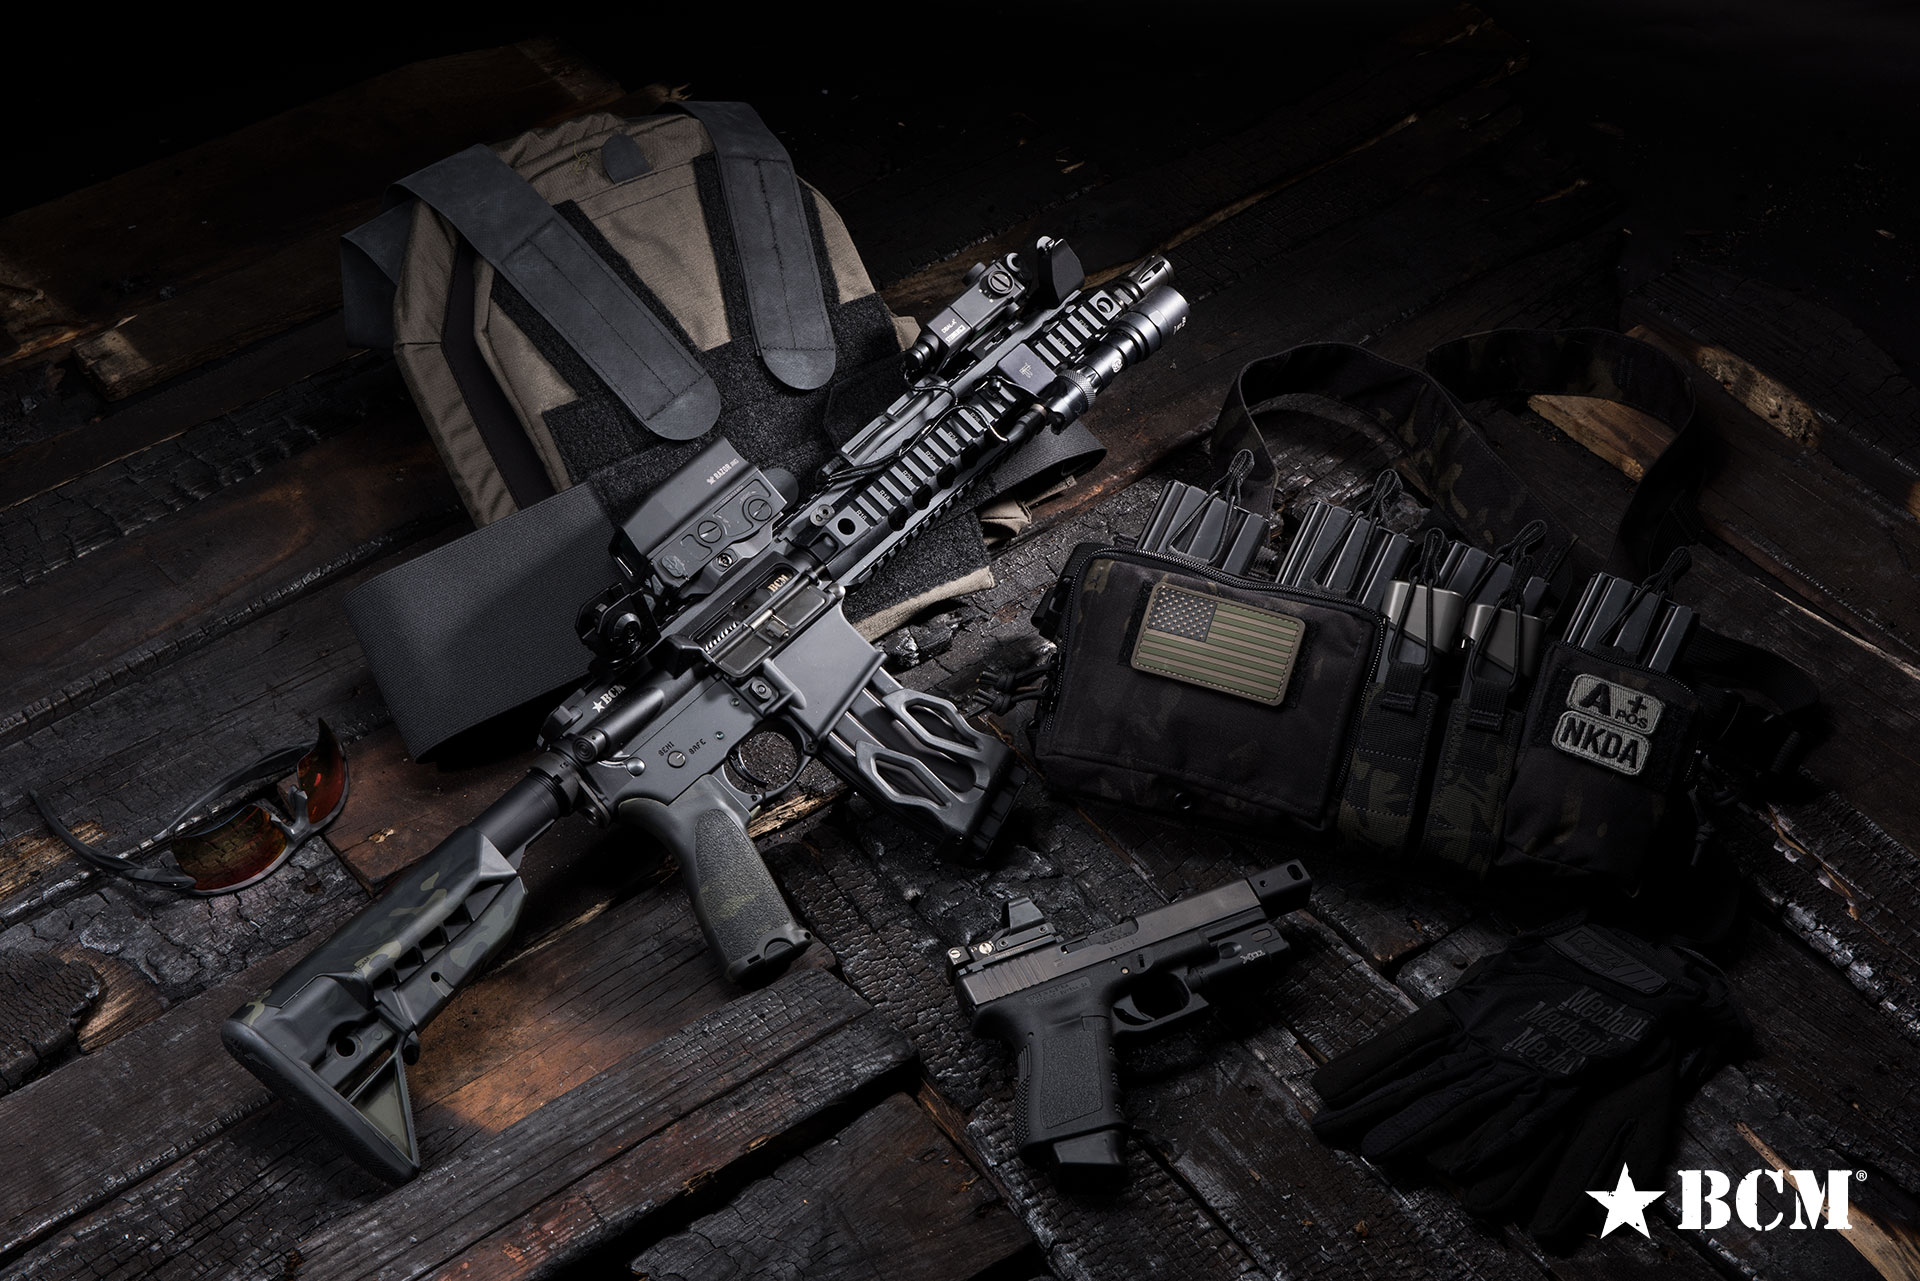 BCM® Rifle Company